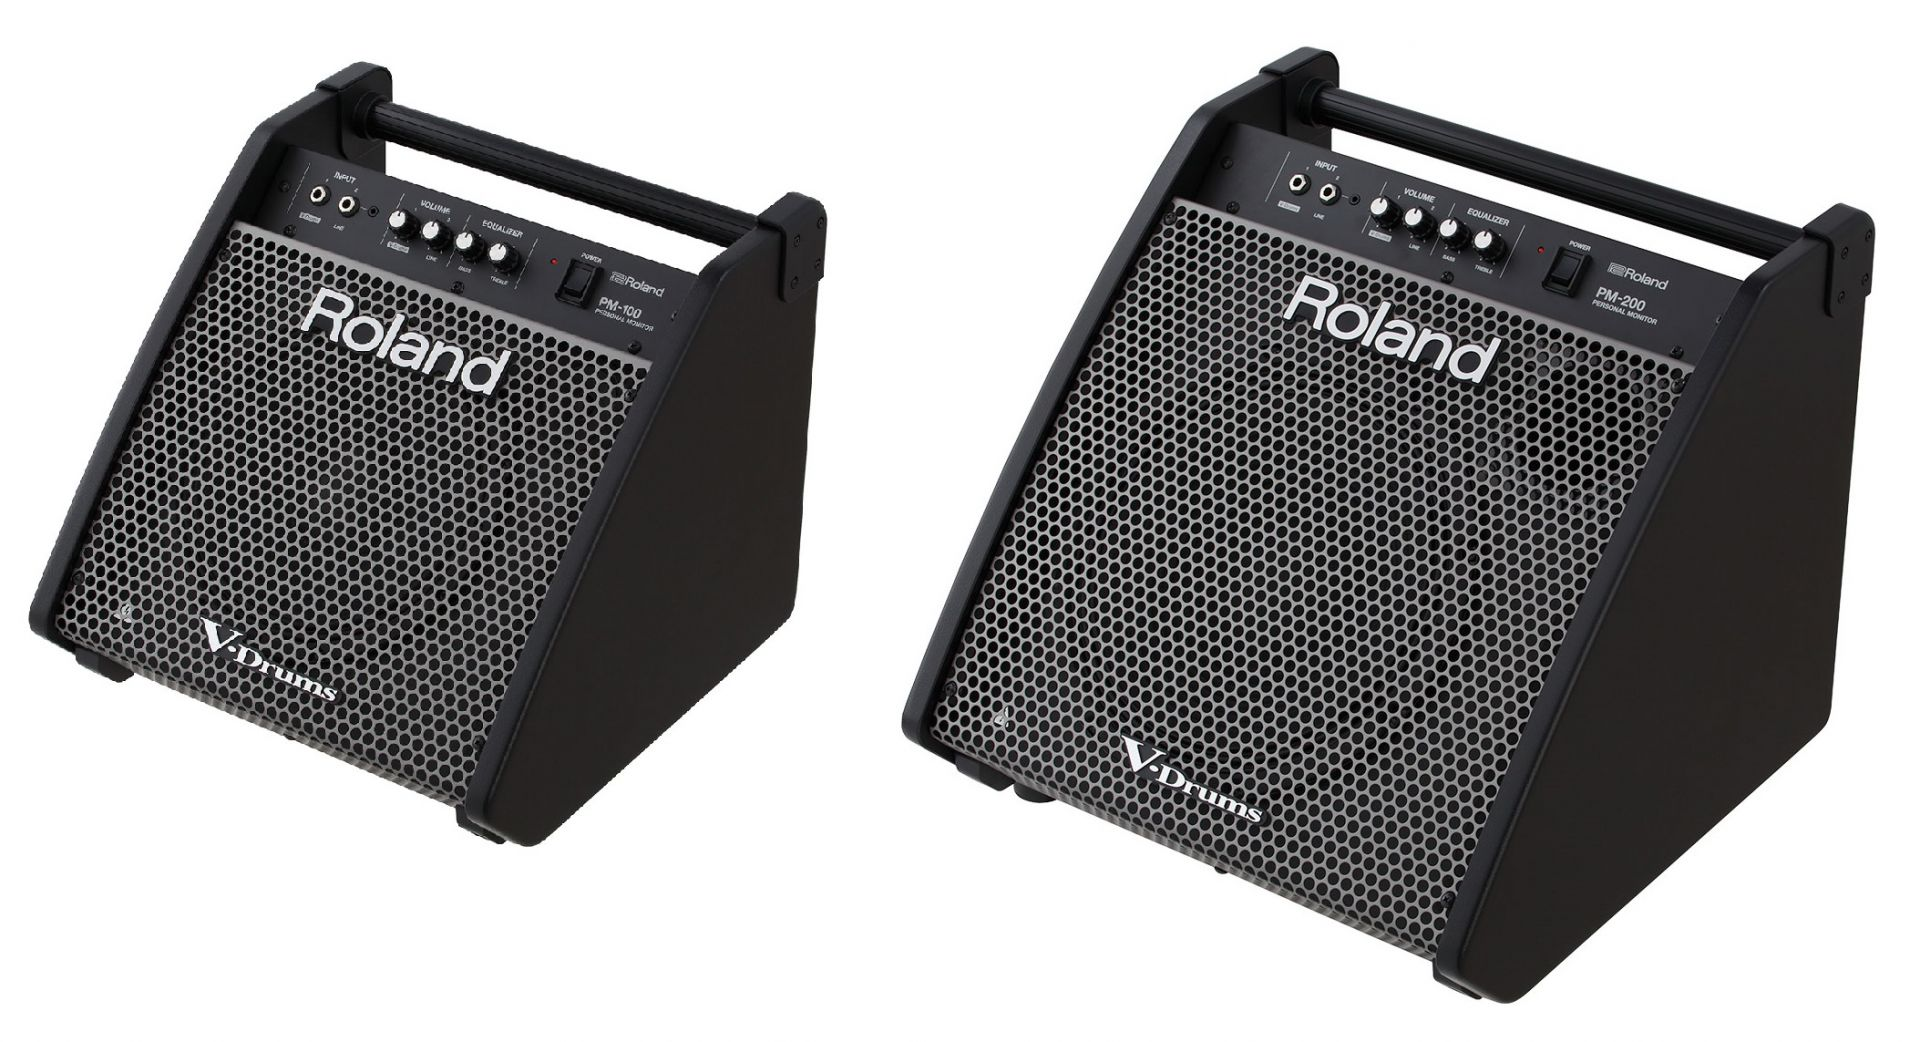 Roland V-Drums 専用のモニター・スピーカー PM-100 / PM-200